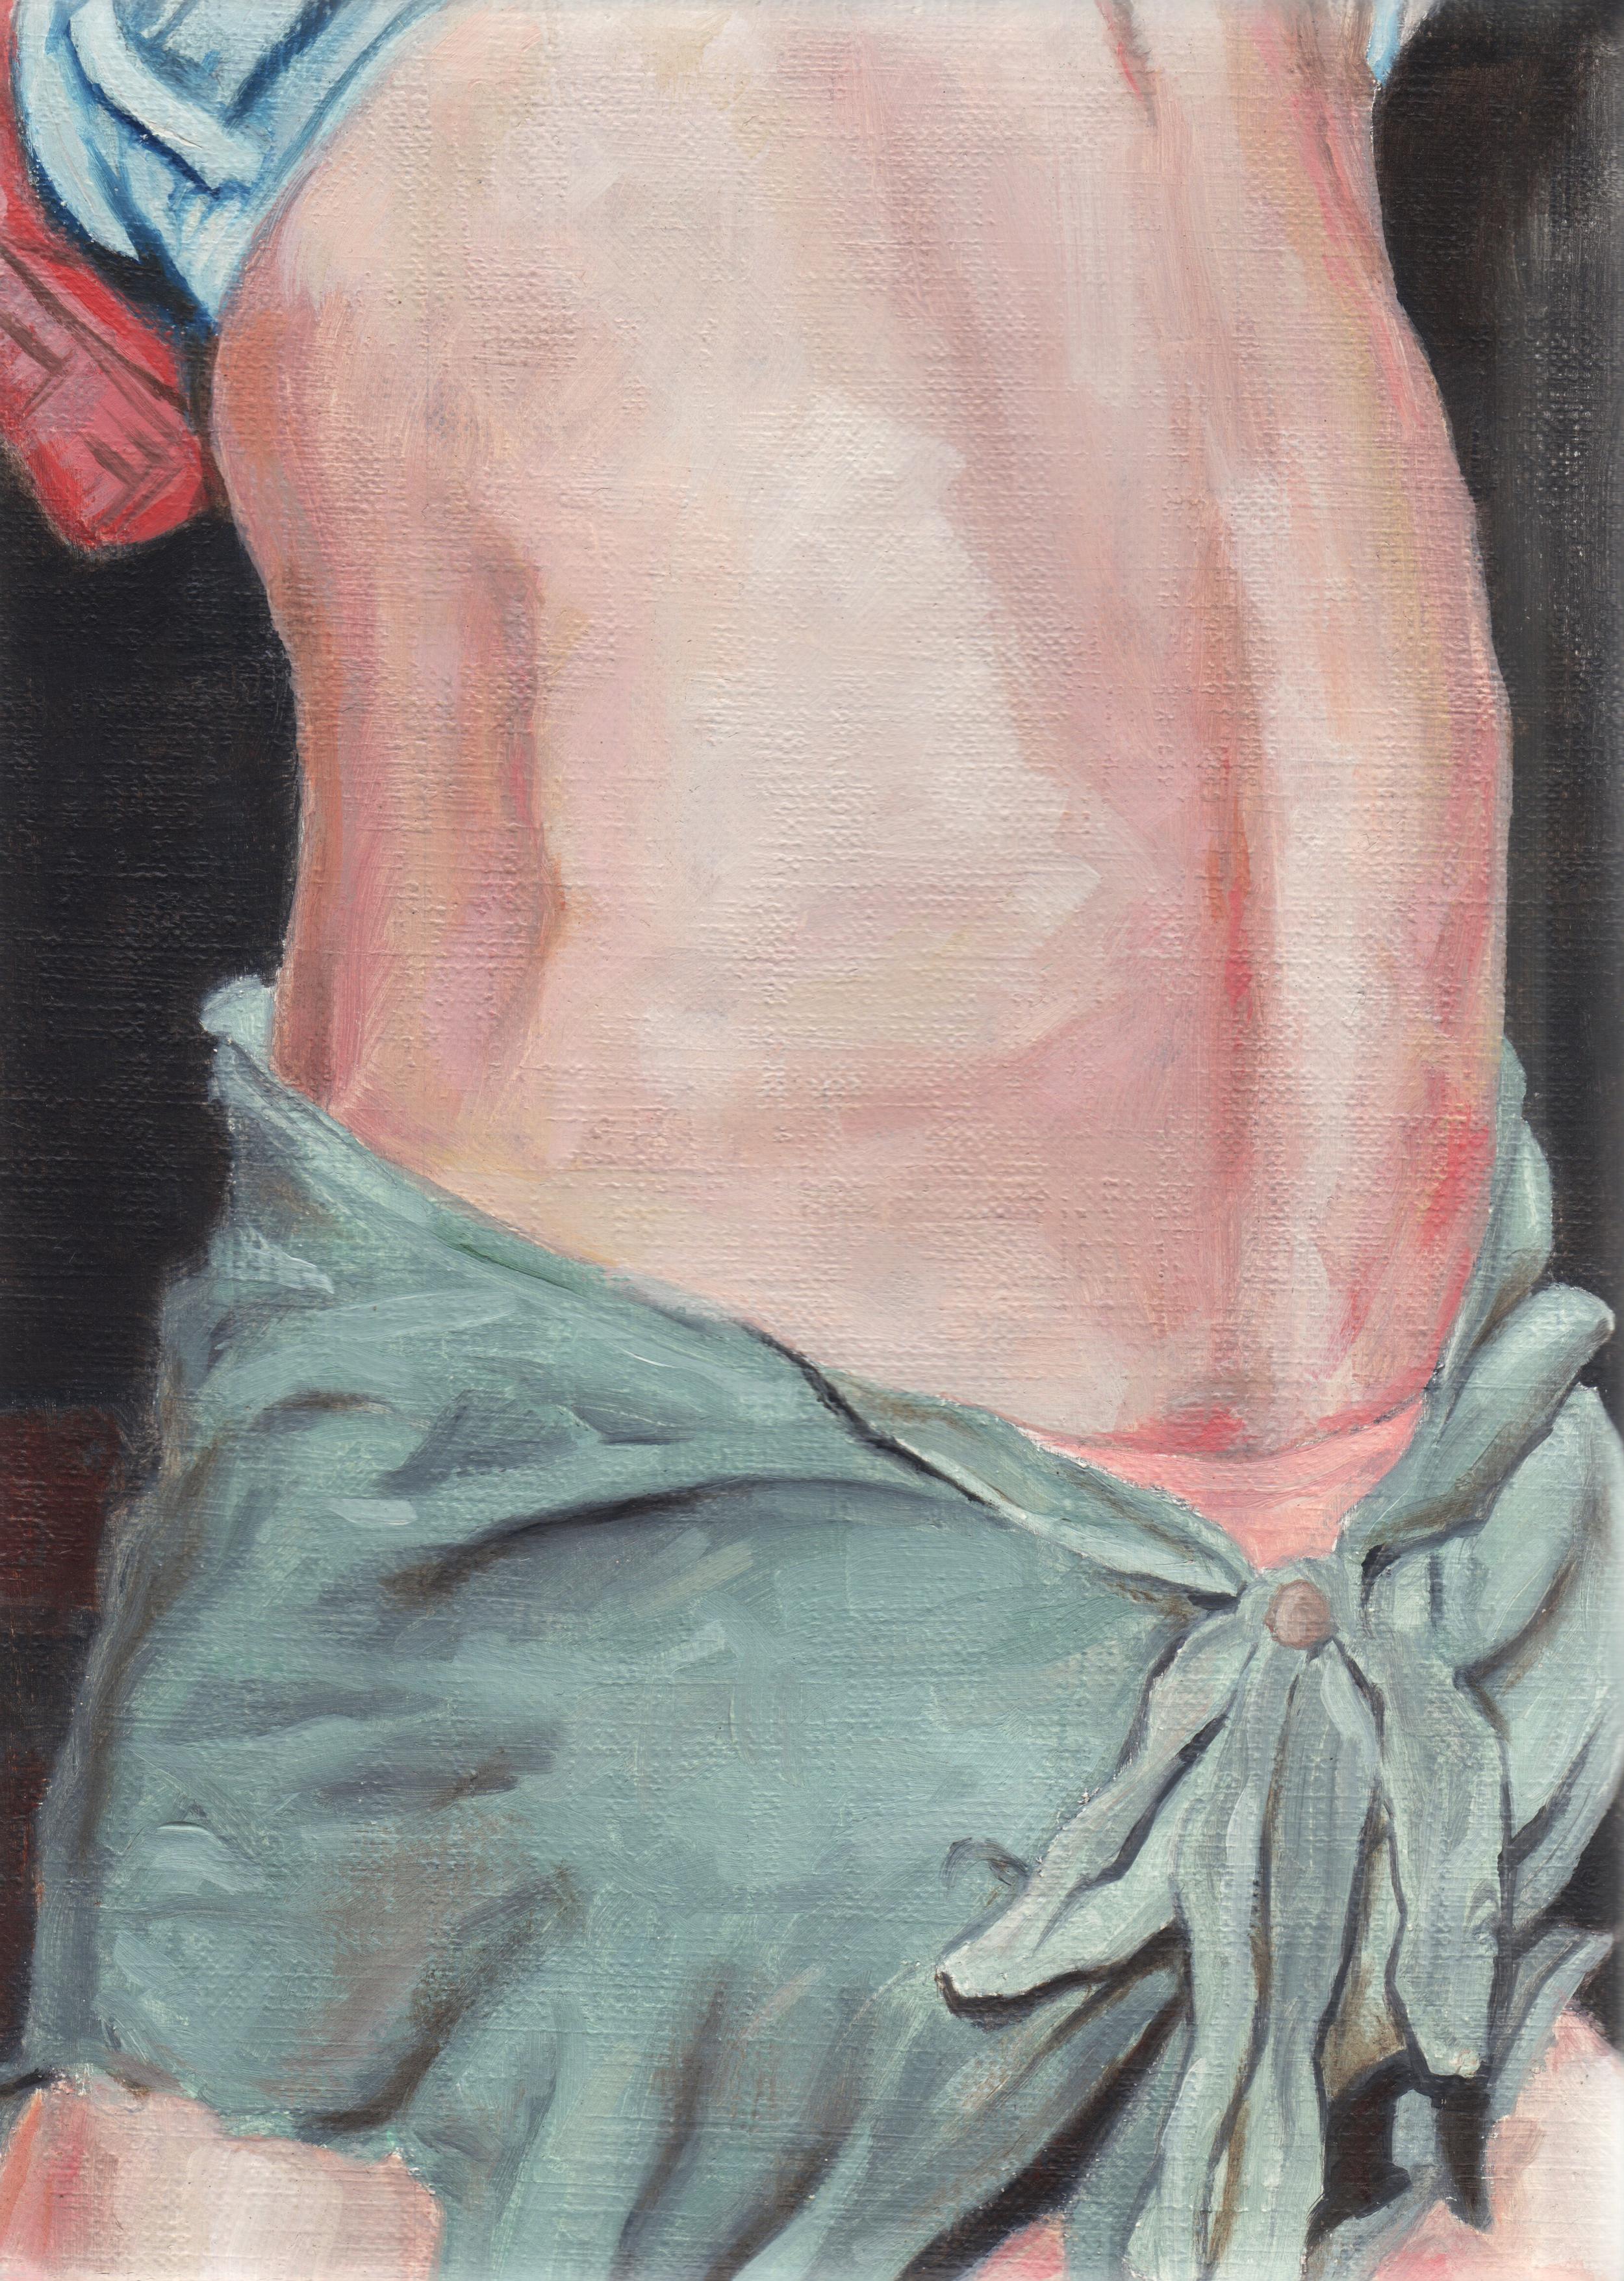 """Perv Painting V"" (series)"